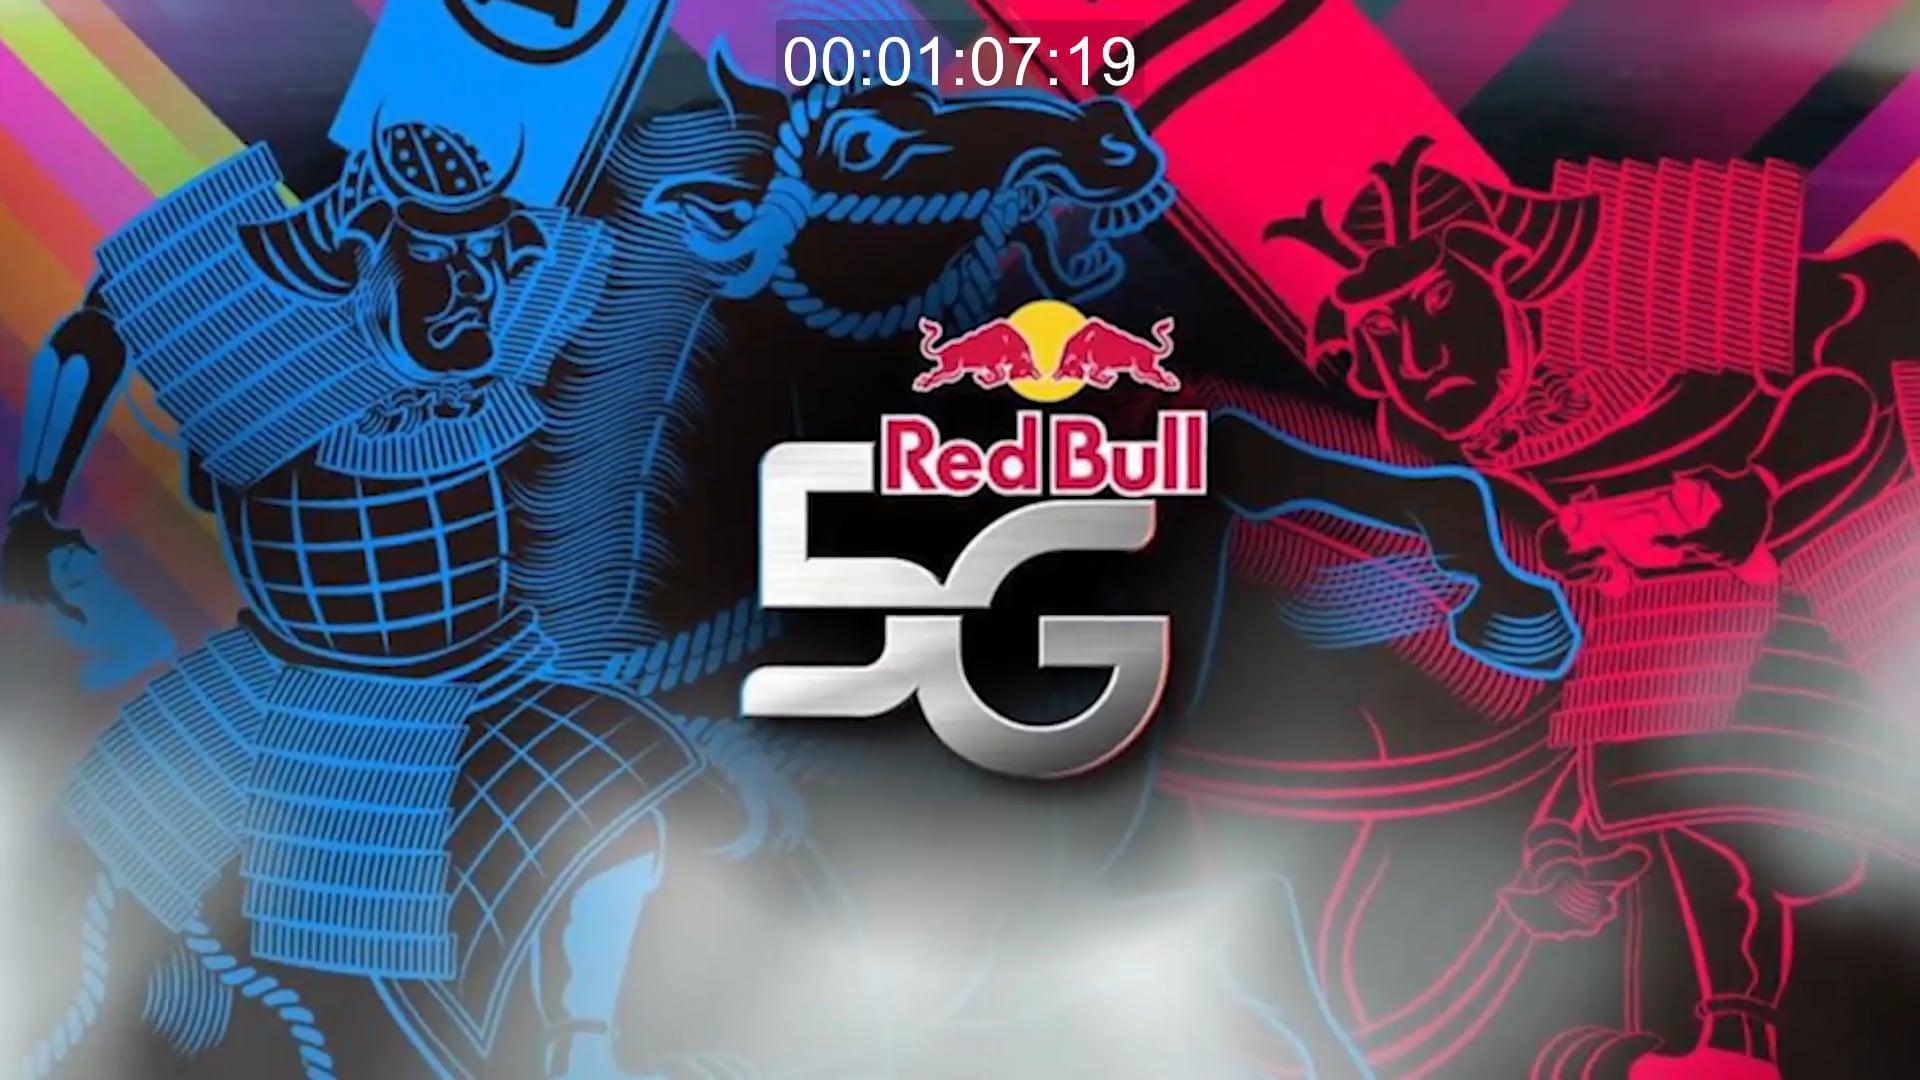 REDBULL_E SportsSizzle_5.1 Mixing & Bumper Design_ad_DragonflySound